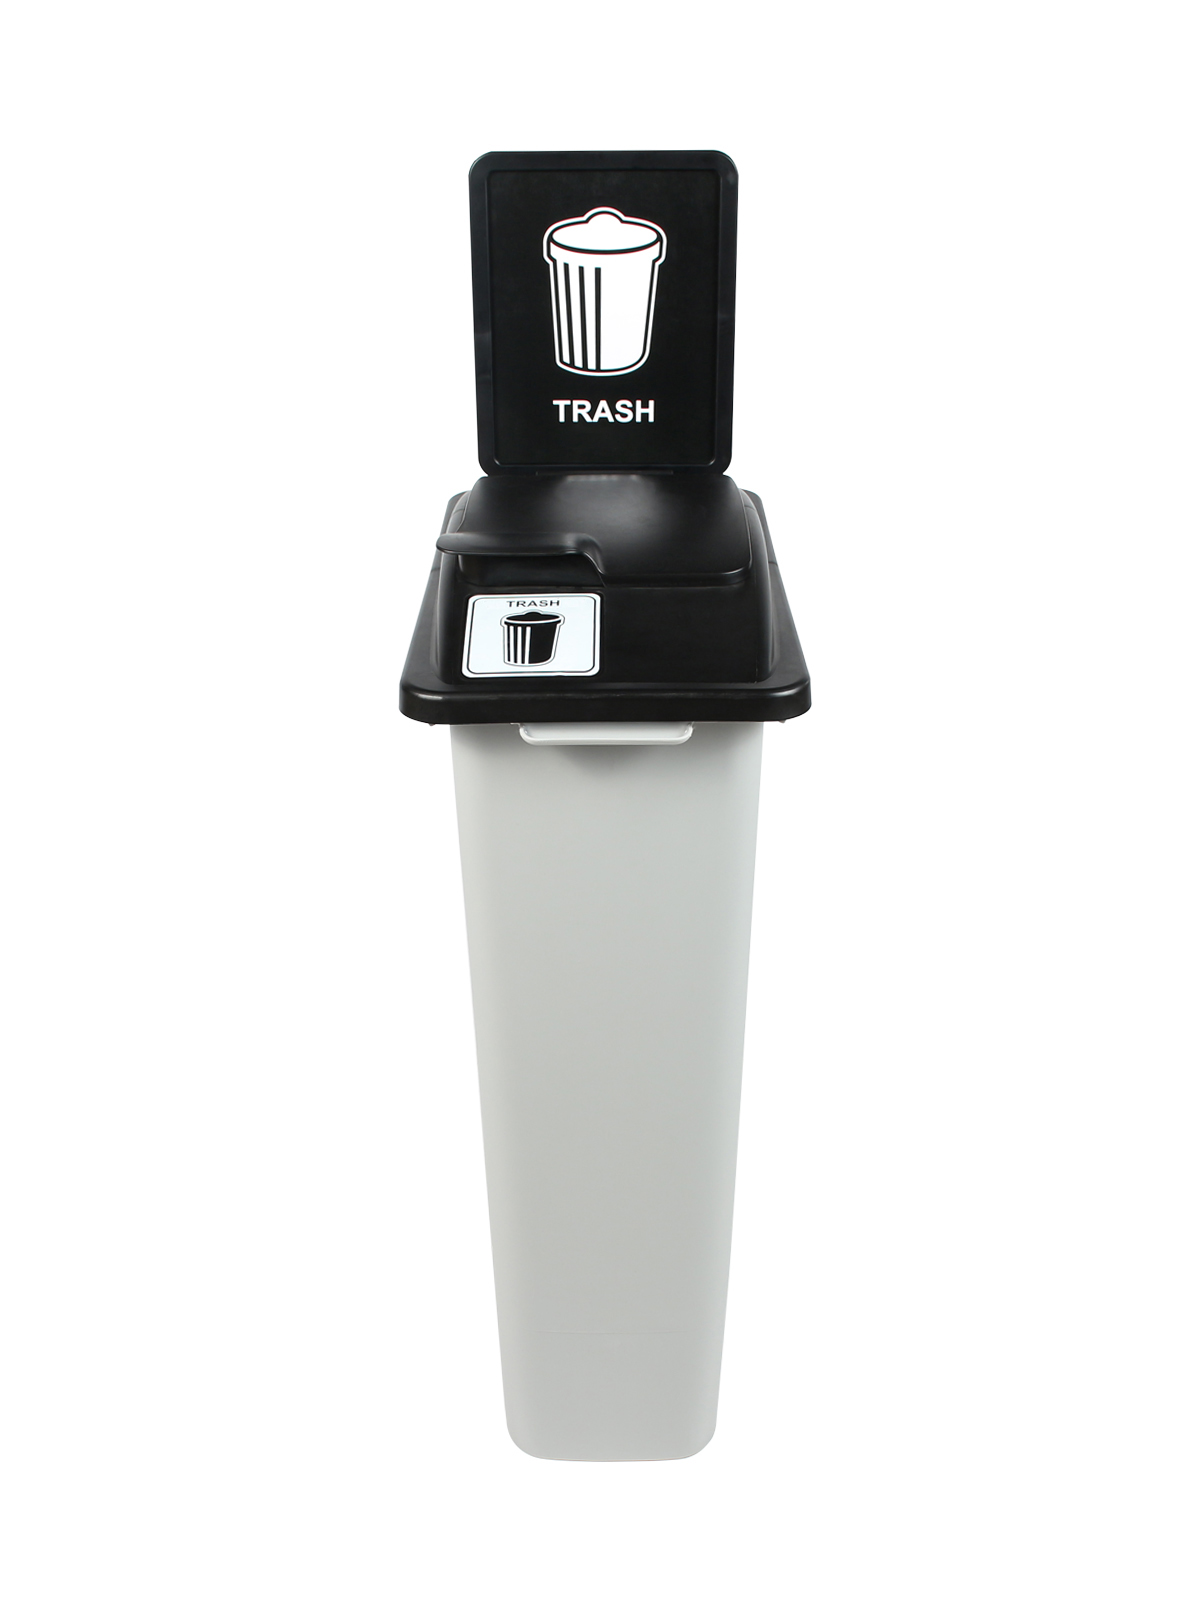 WASTE WATCHER - Single - Trash - Solid Lift - Grey-Black